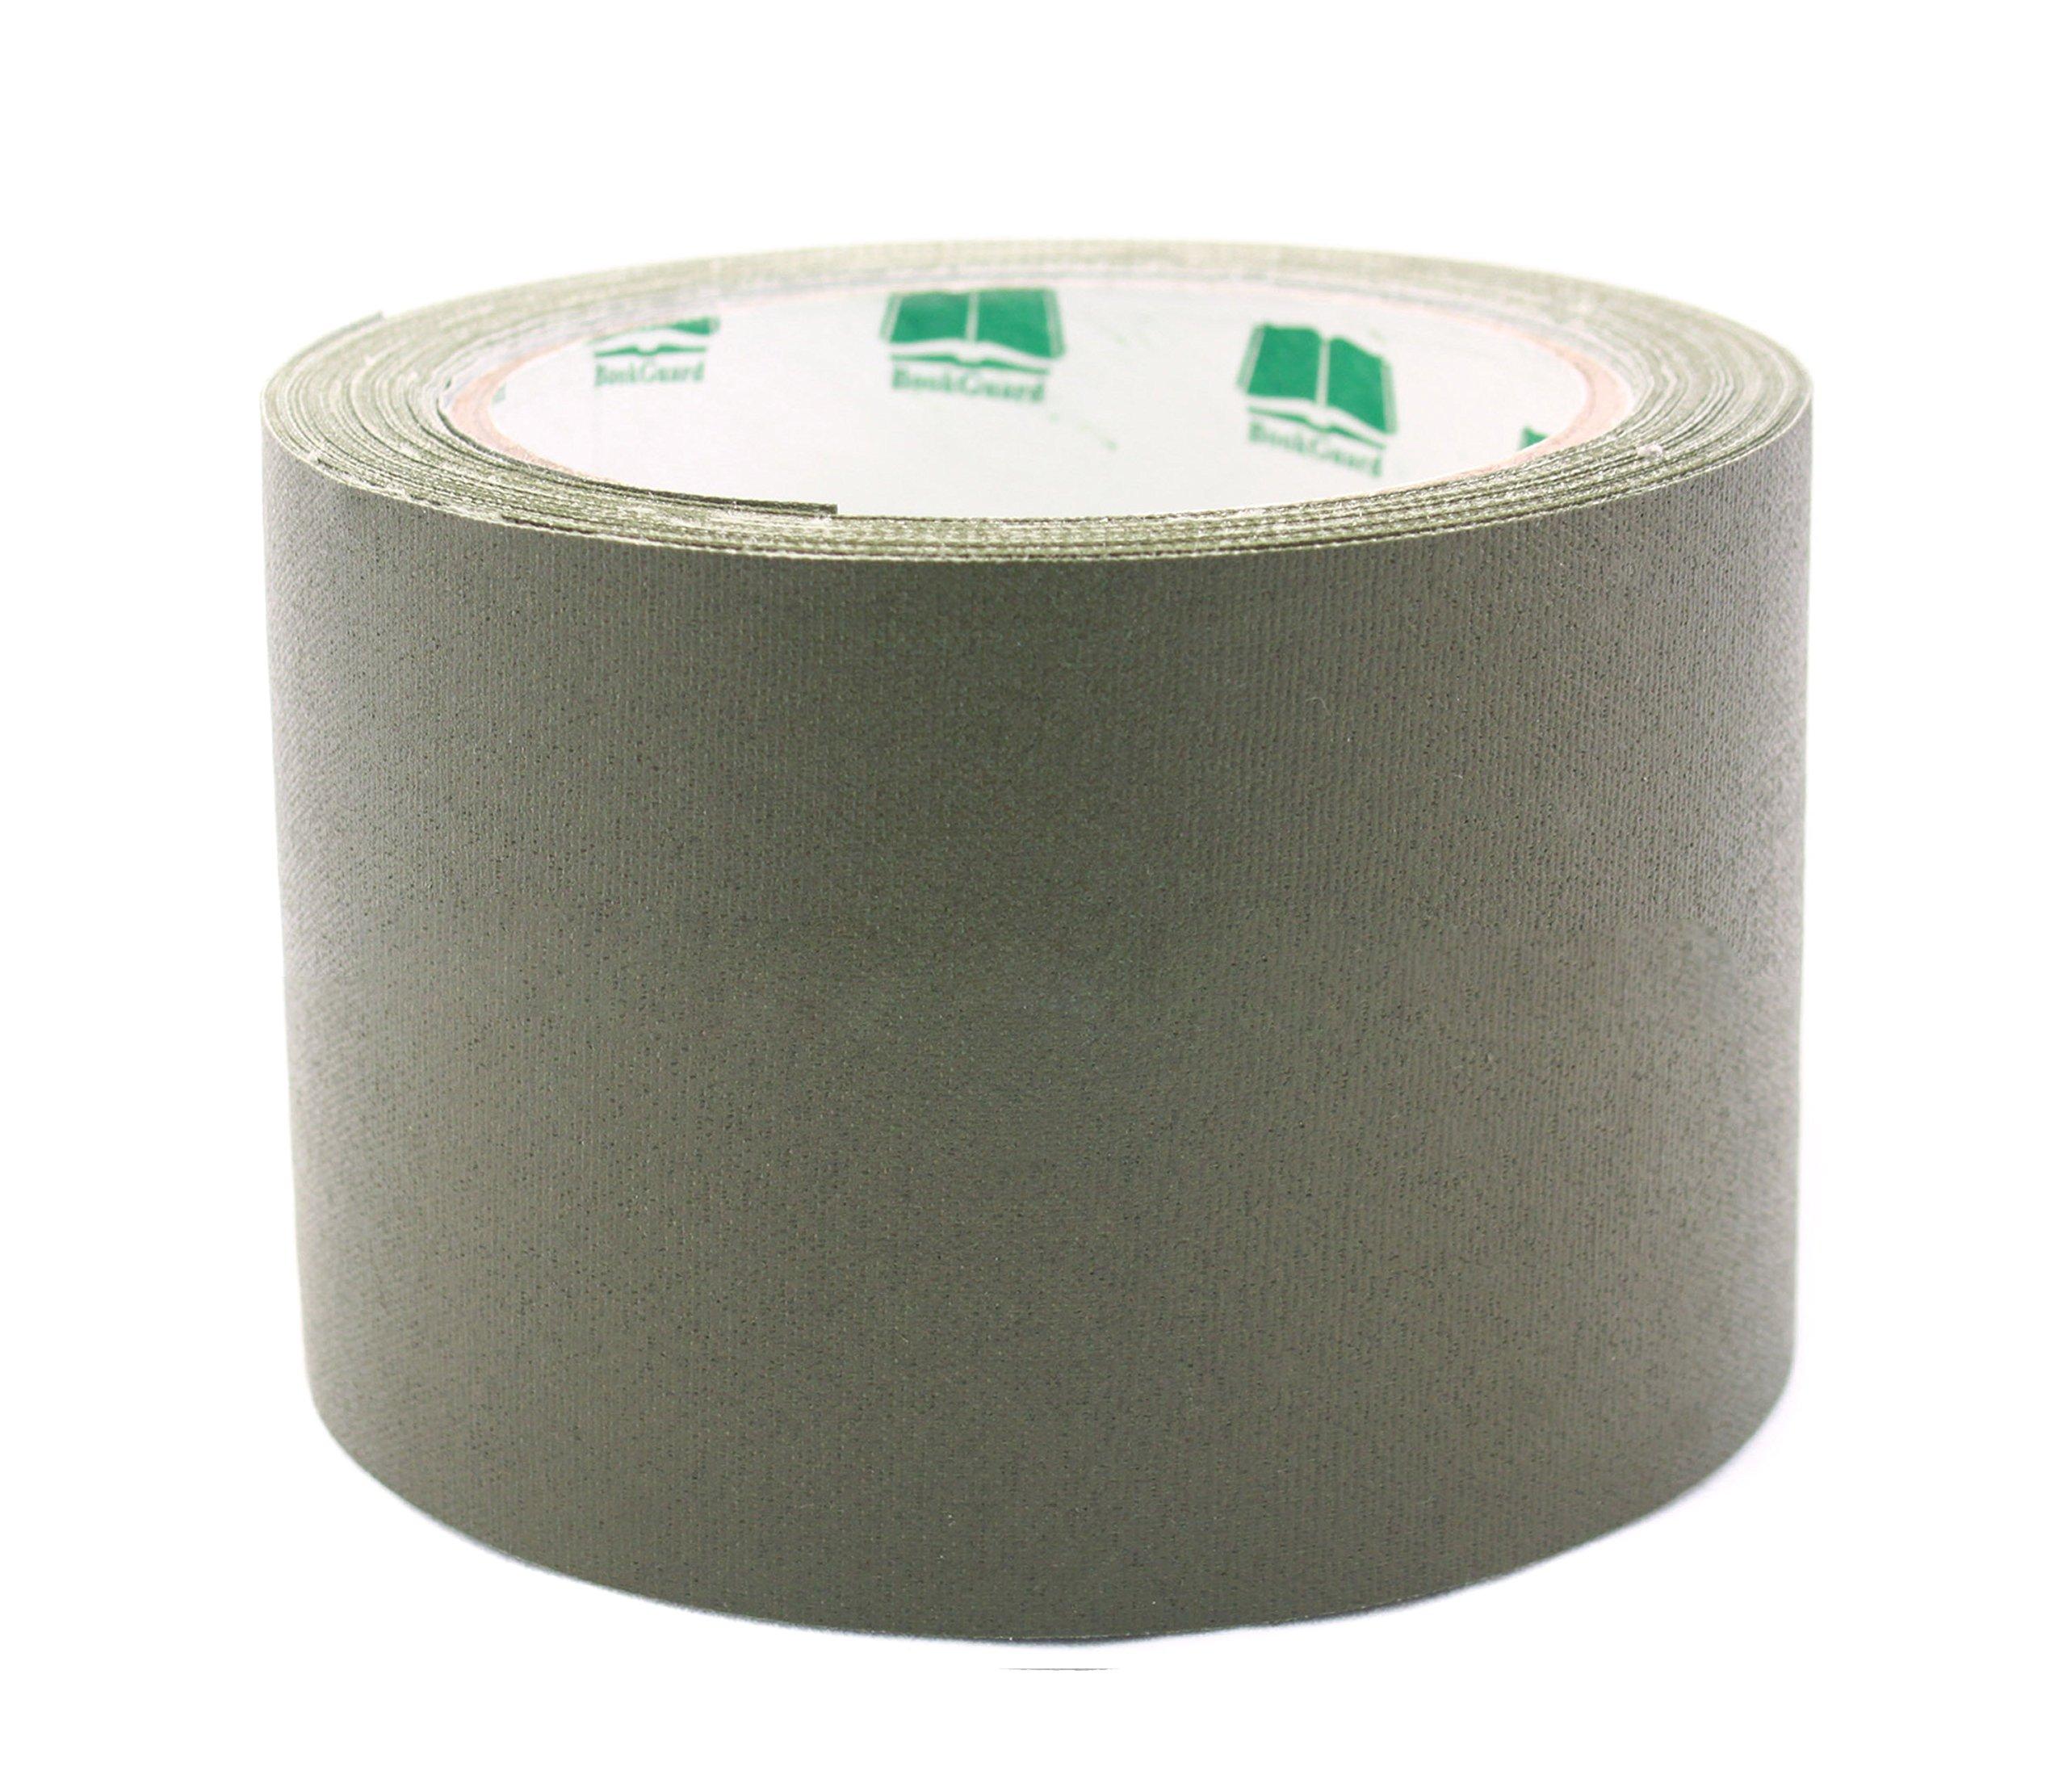 3'' Olive Colored Premium-Cloth Book Binding Repair Tape | 15 Yard Roll (BookGuard Brand)